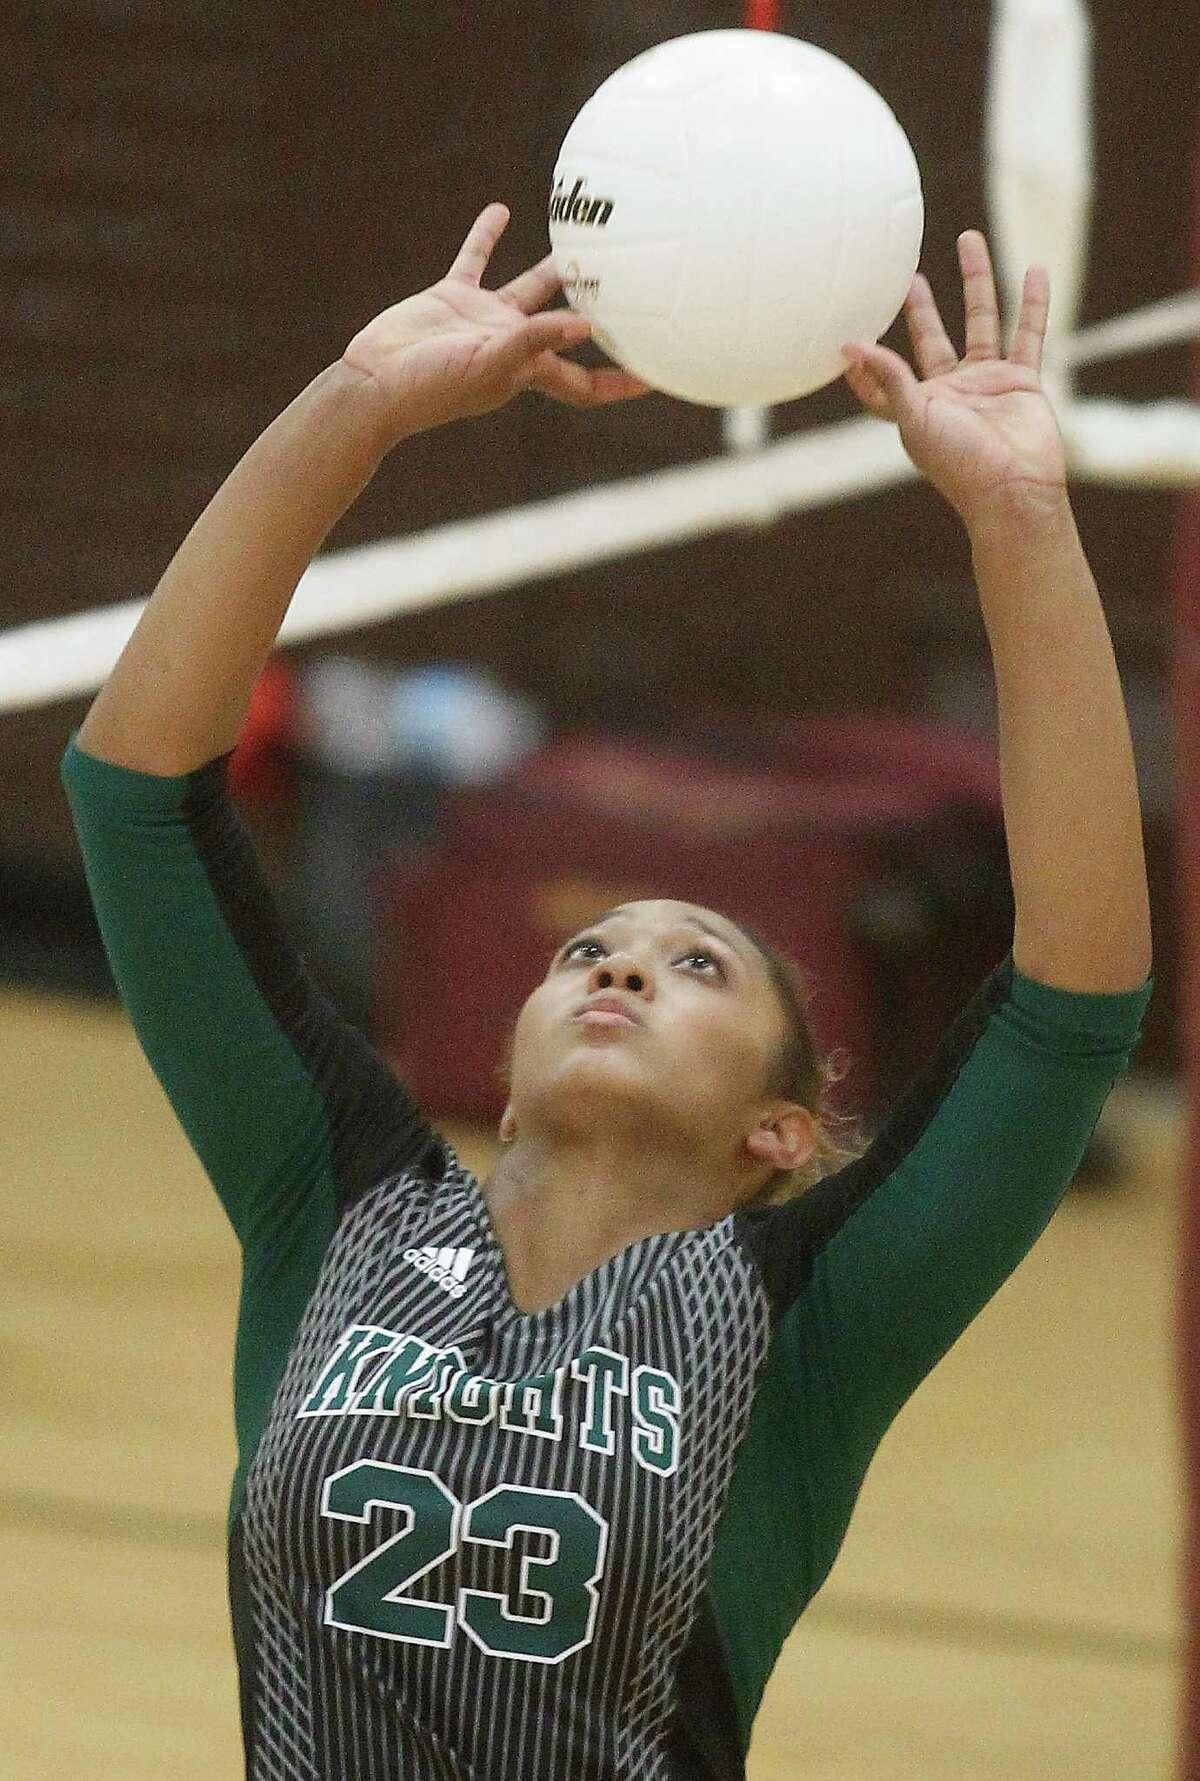 Athletic skill is in the genes of Ashlynn Dunbar, daughter of Harlem Globetrotters icon Lou Dunbar.